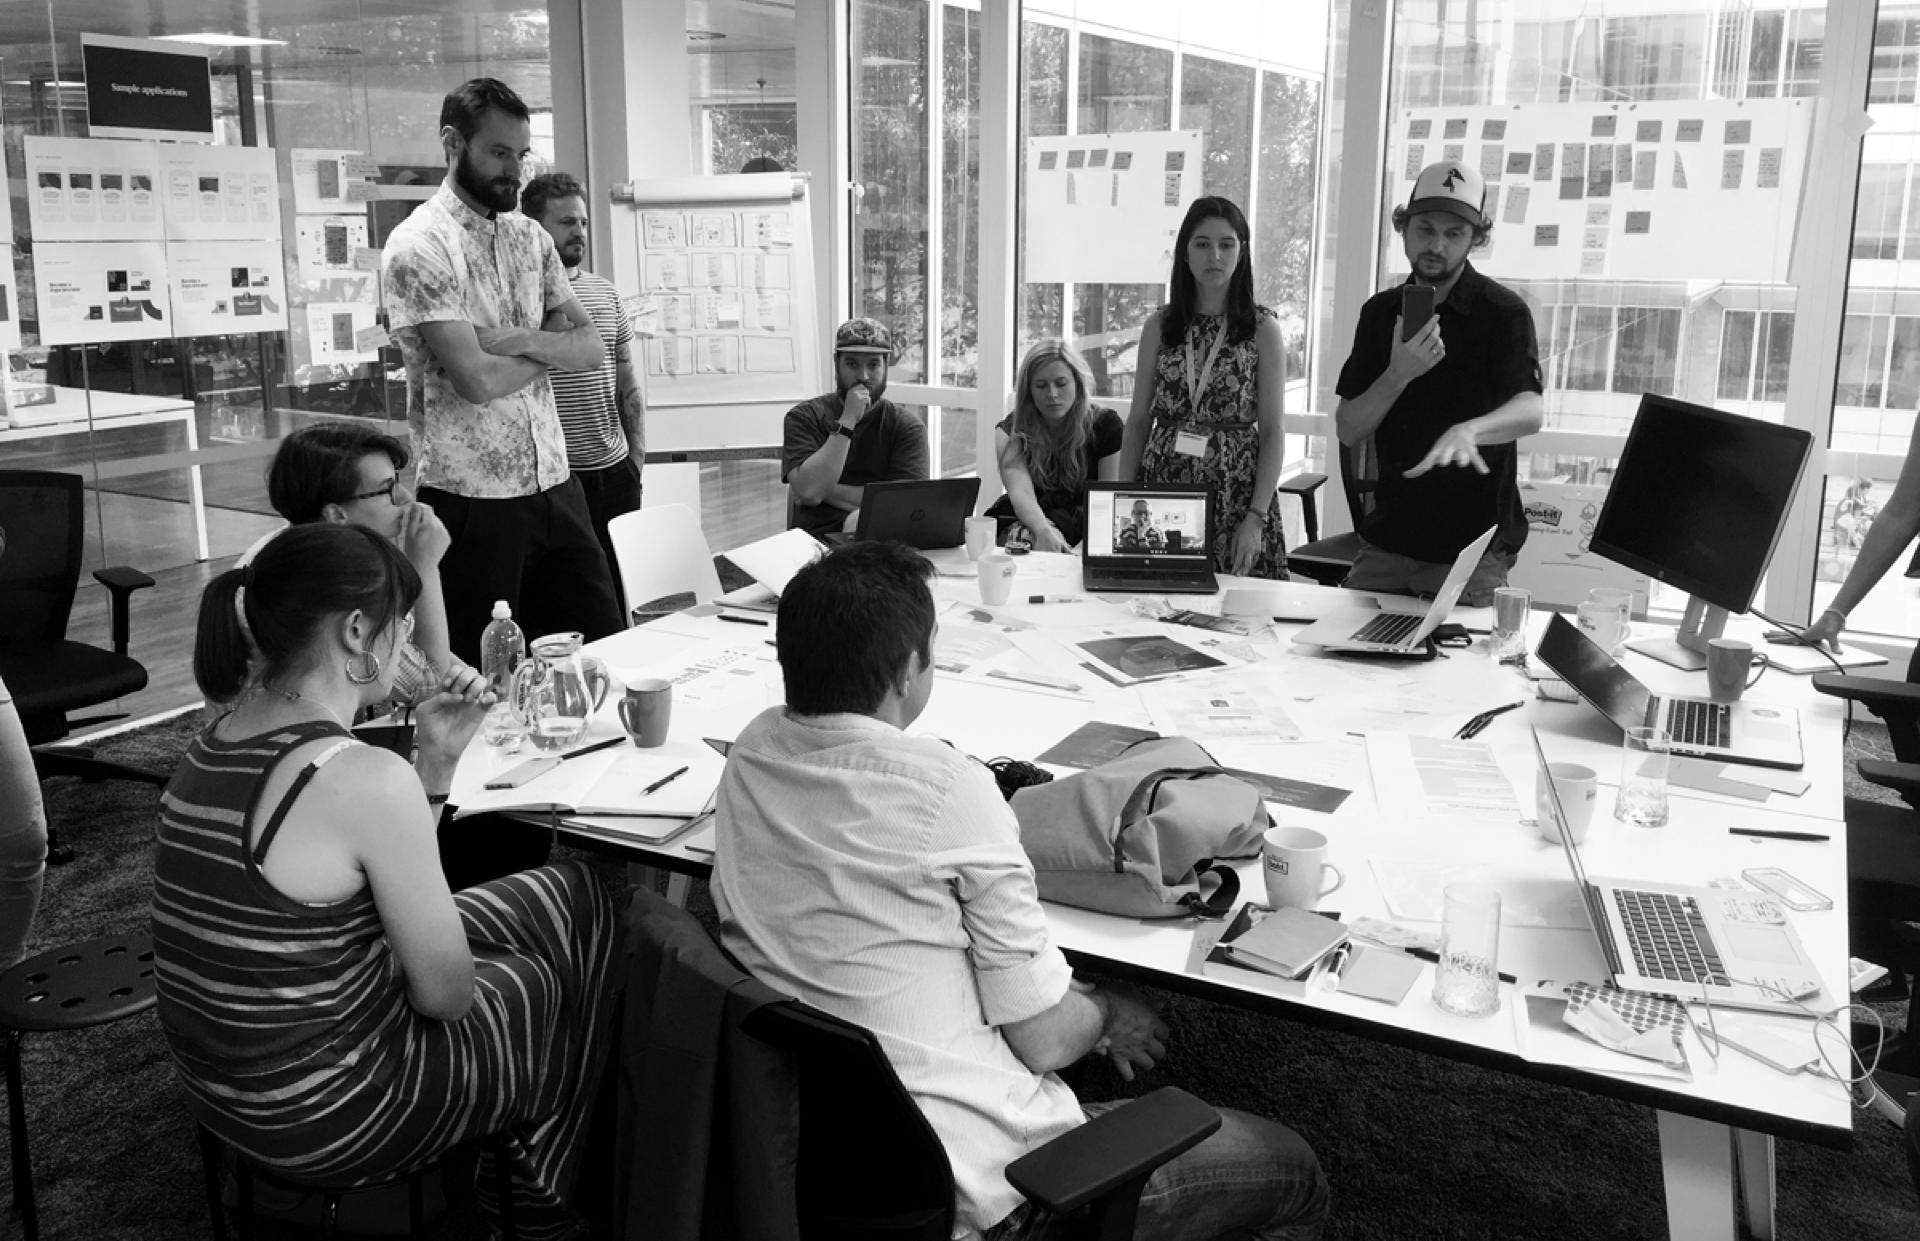 workshop-image-01.jpg